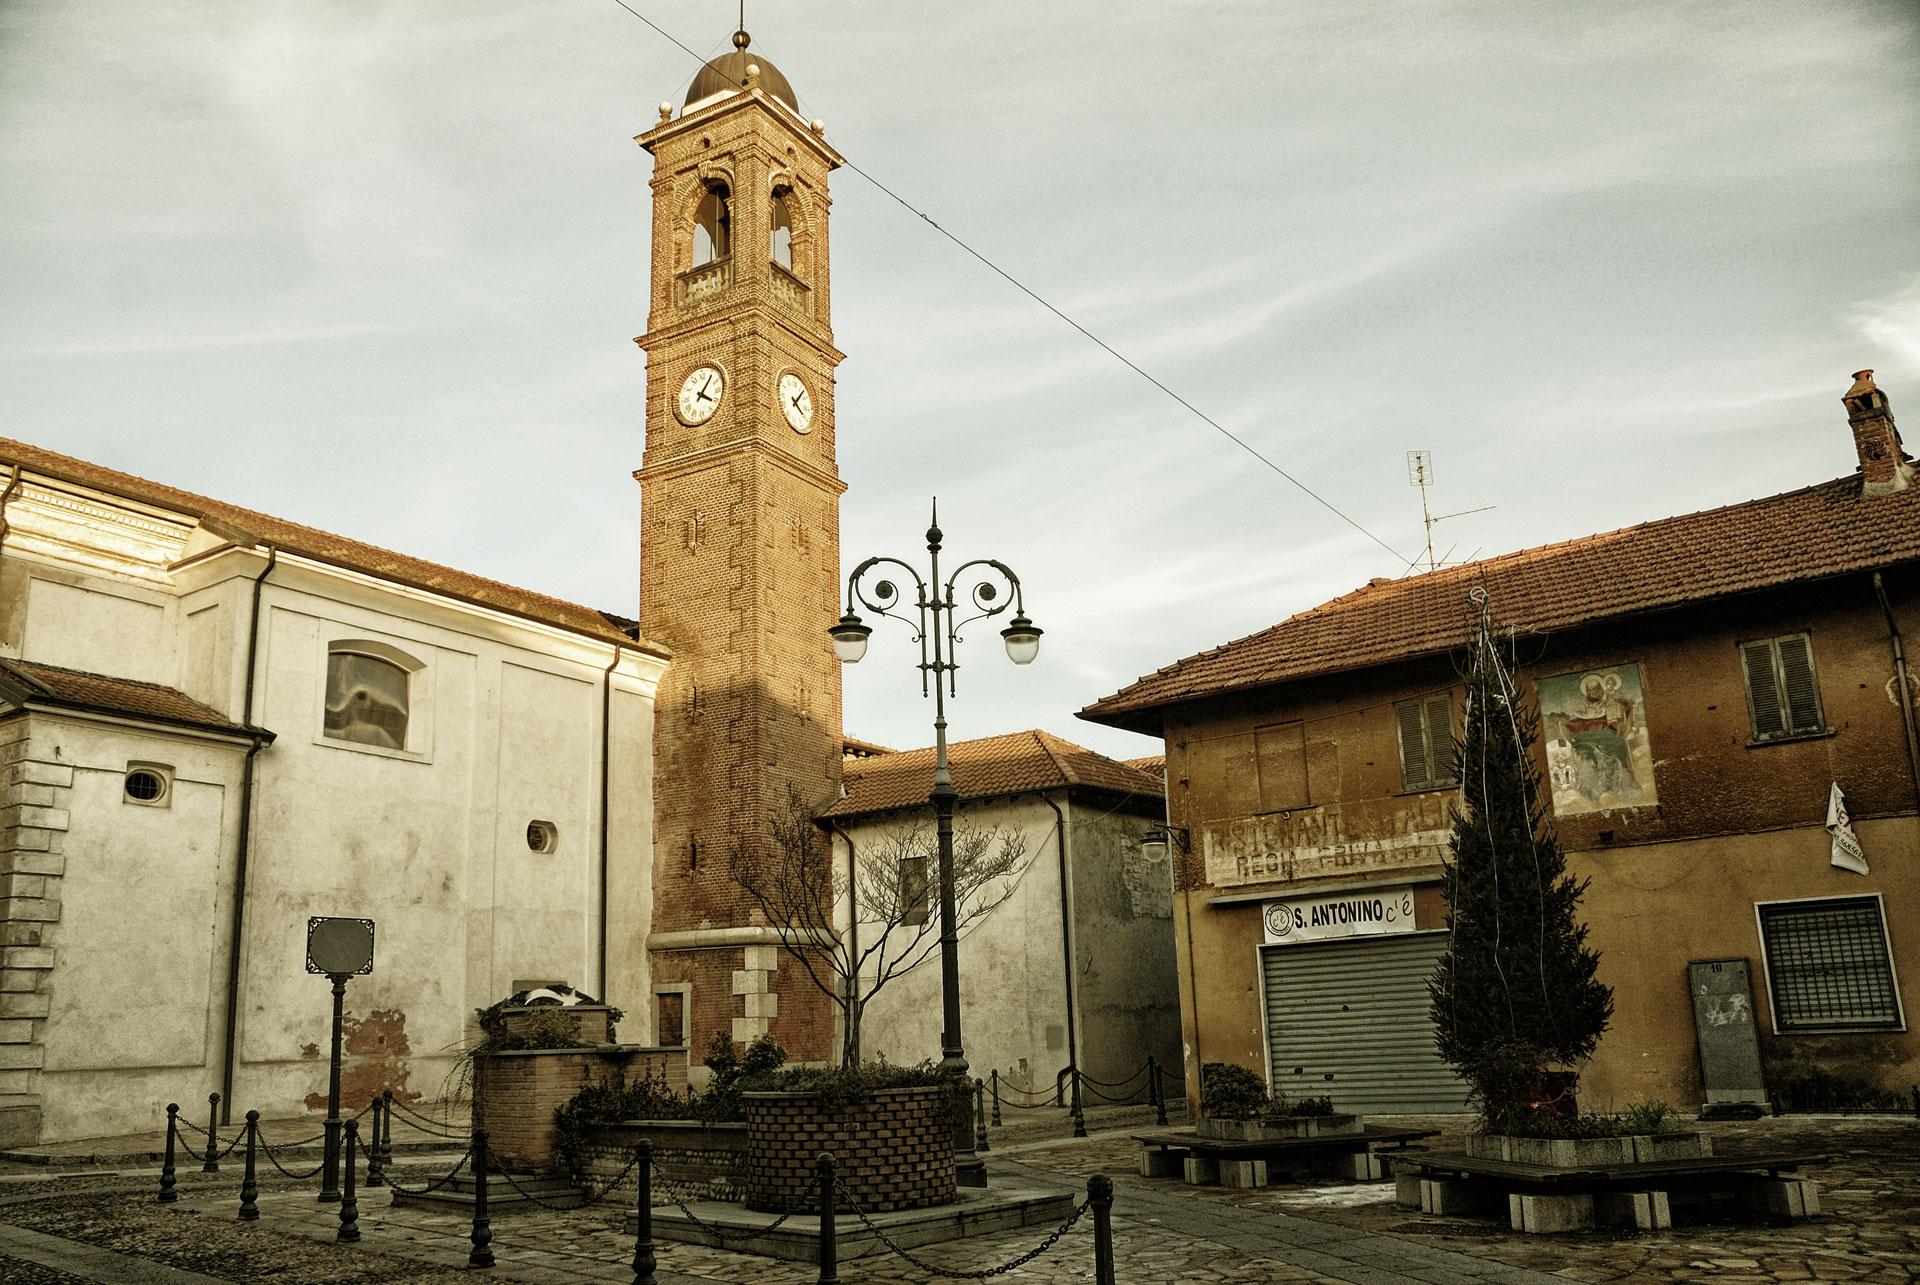 Sant'Antonino Ticino